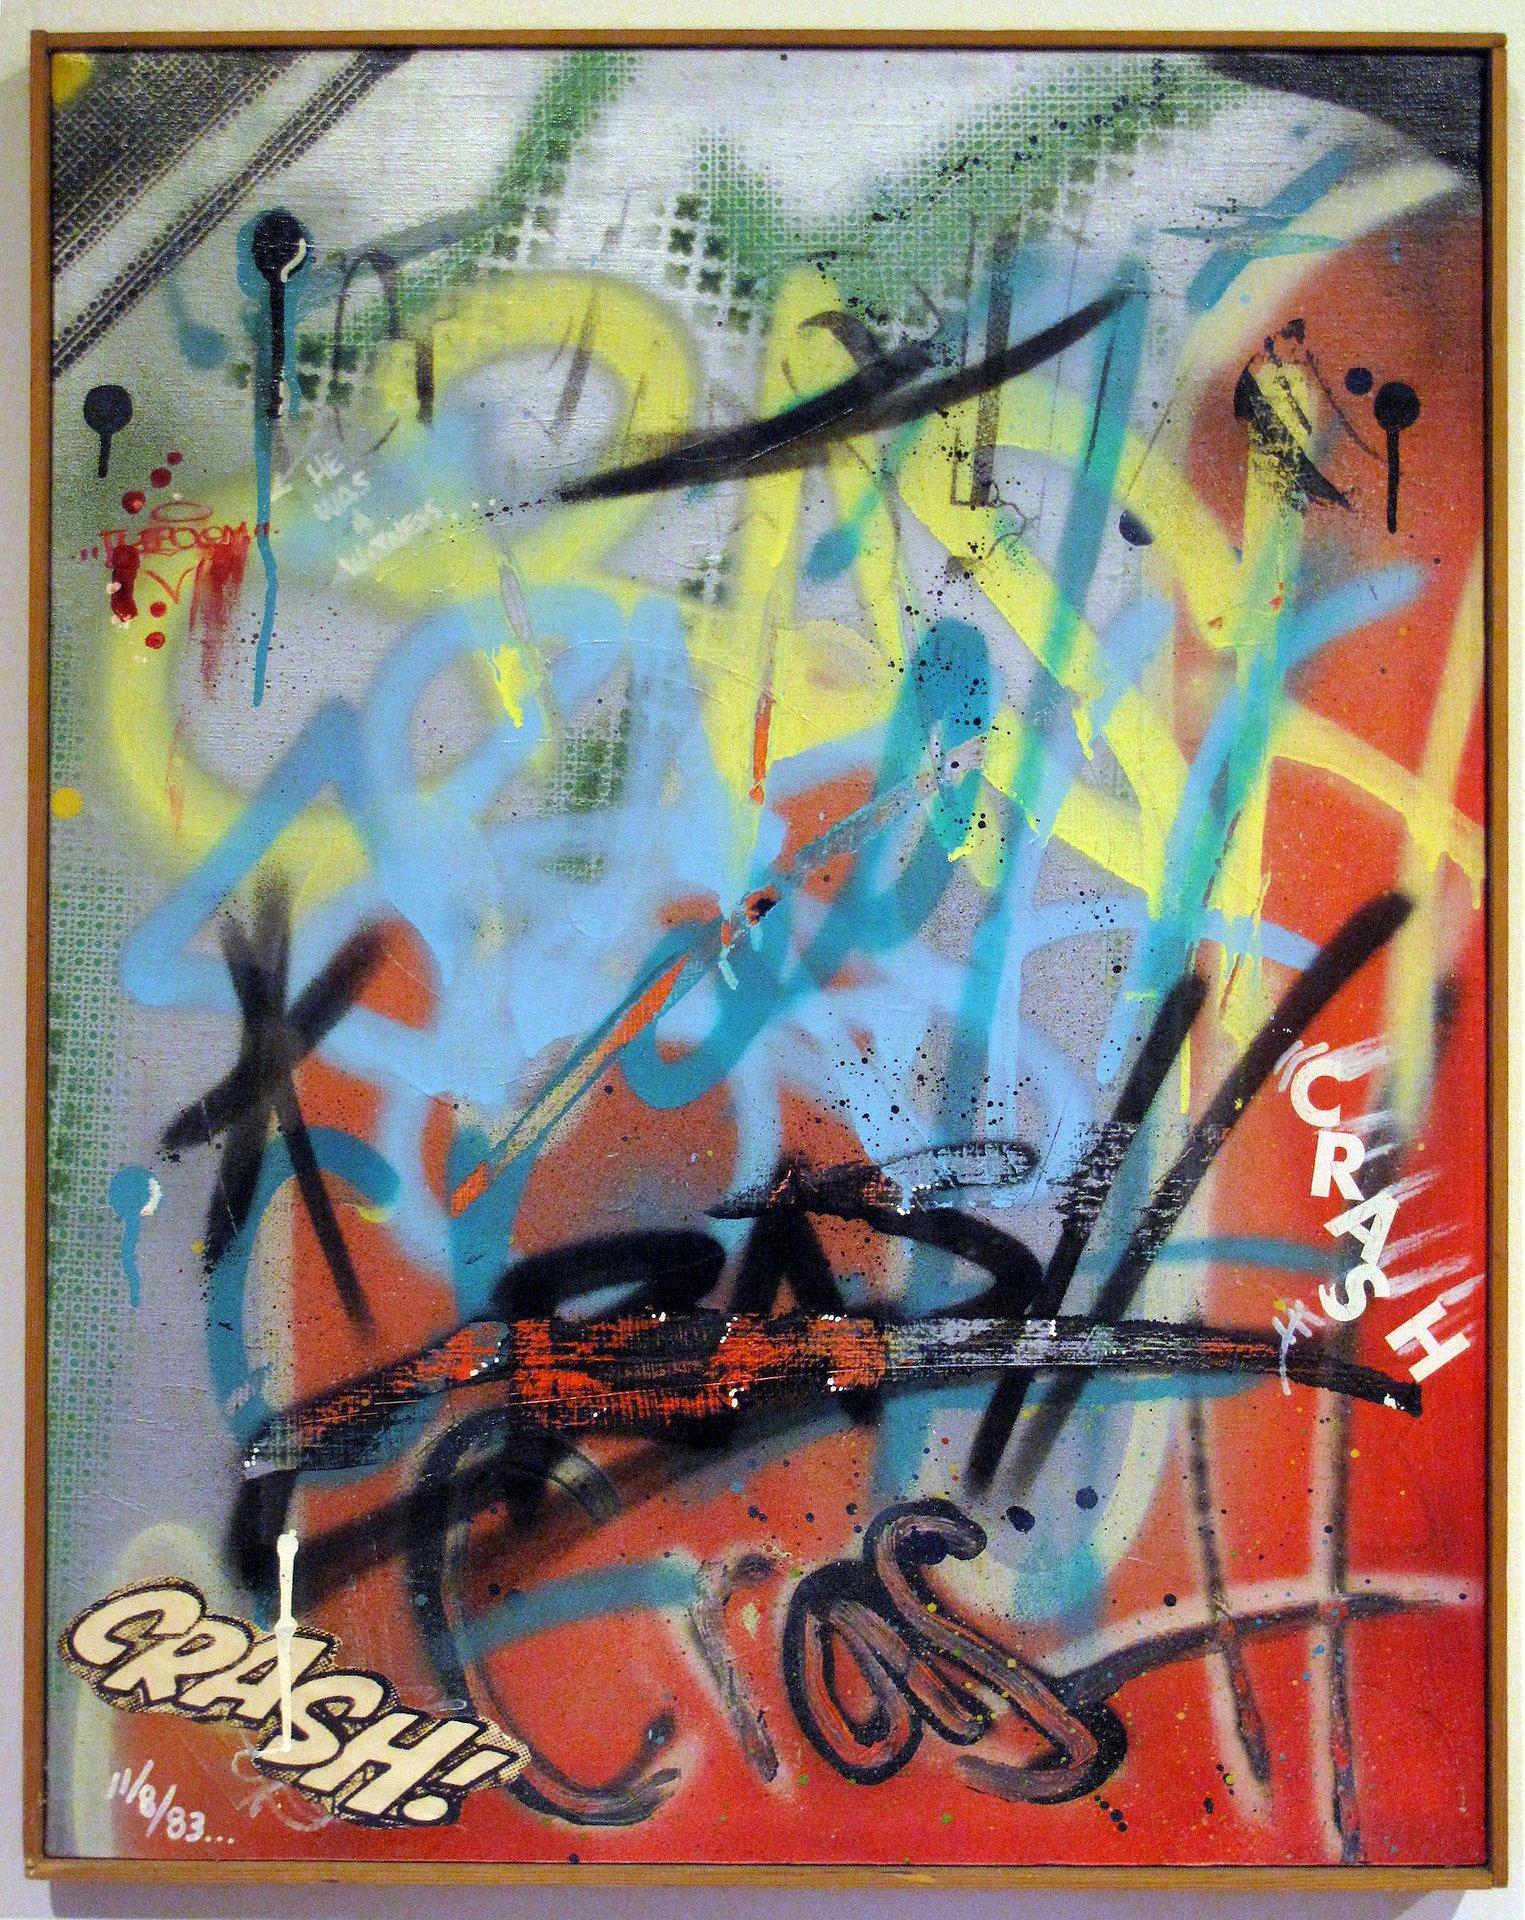 Tags, 1983